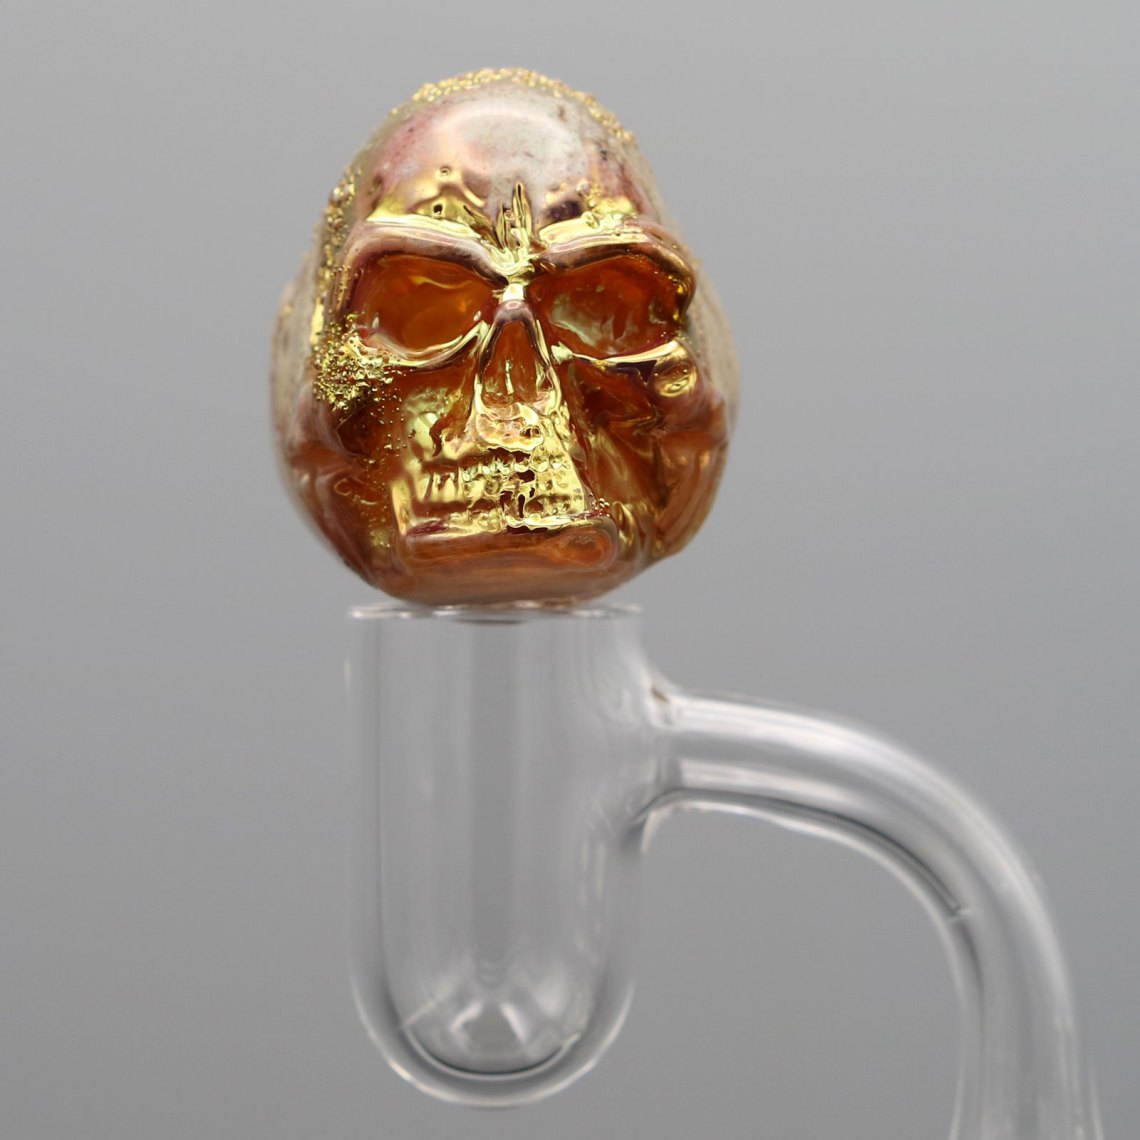 Jonny Carrcass – Gold Fumed Skull Bubblecap